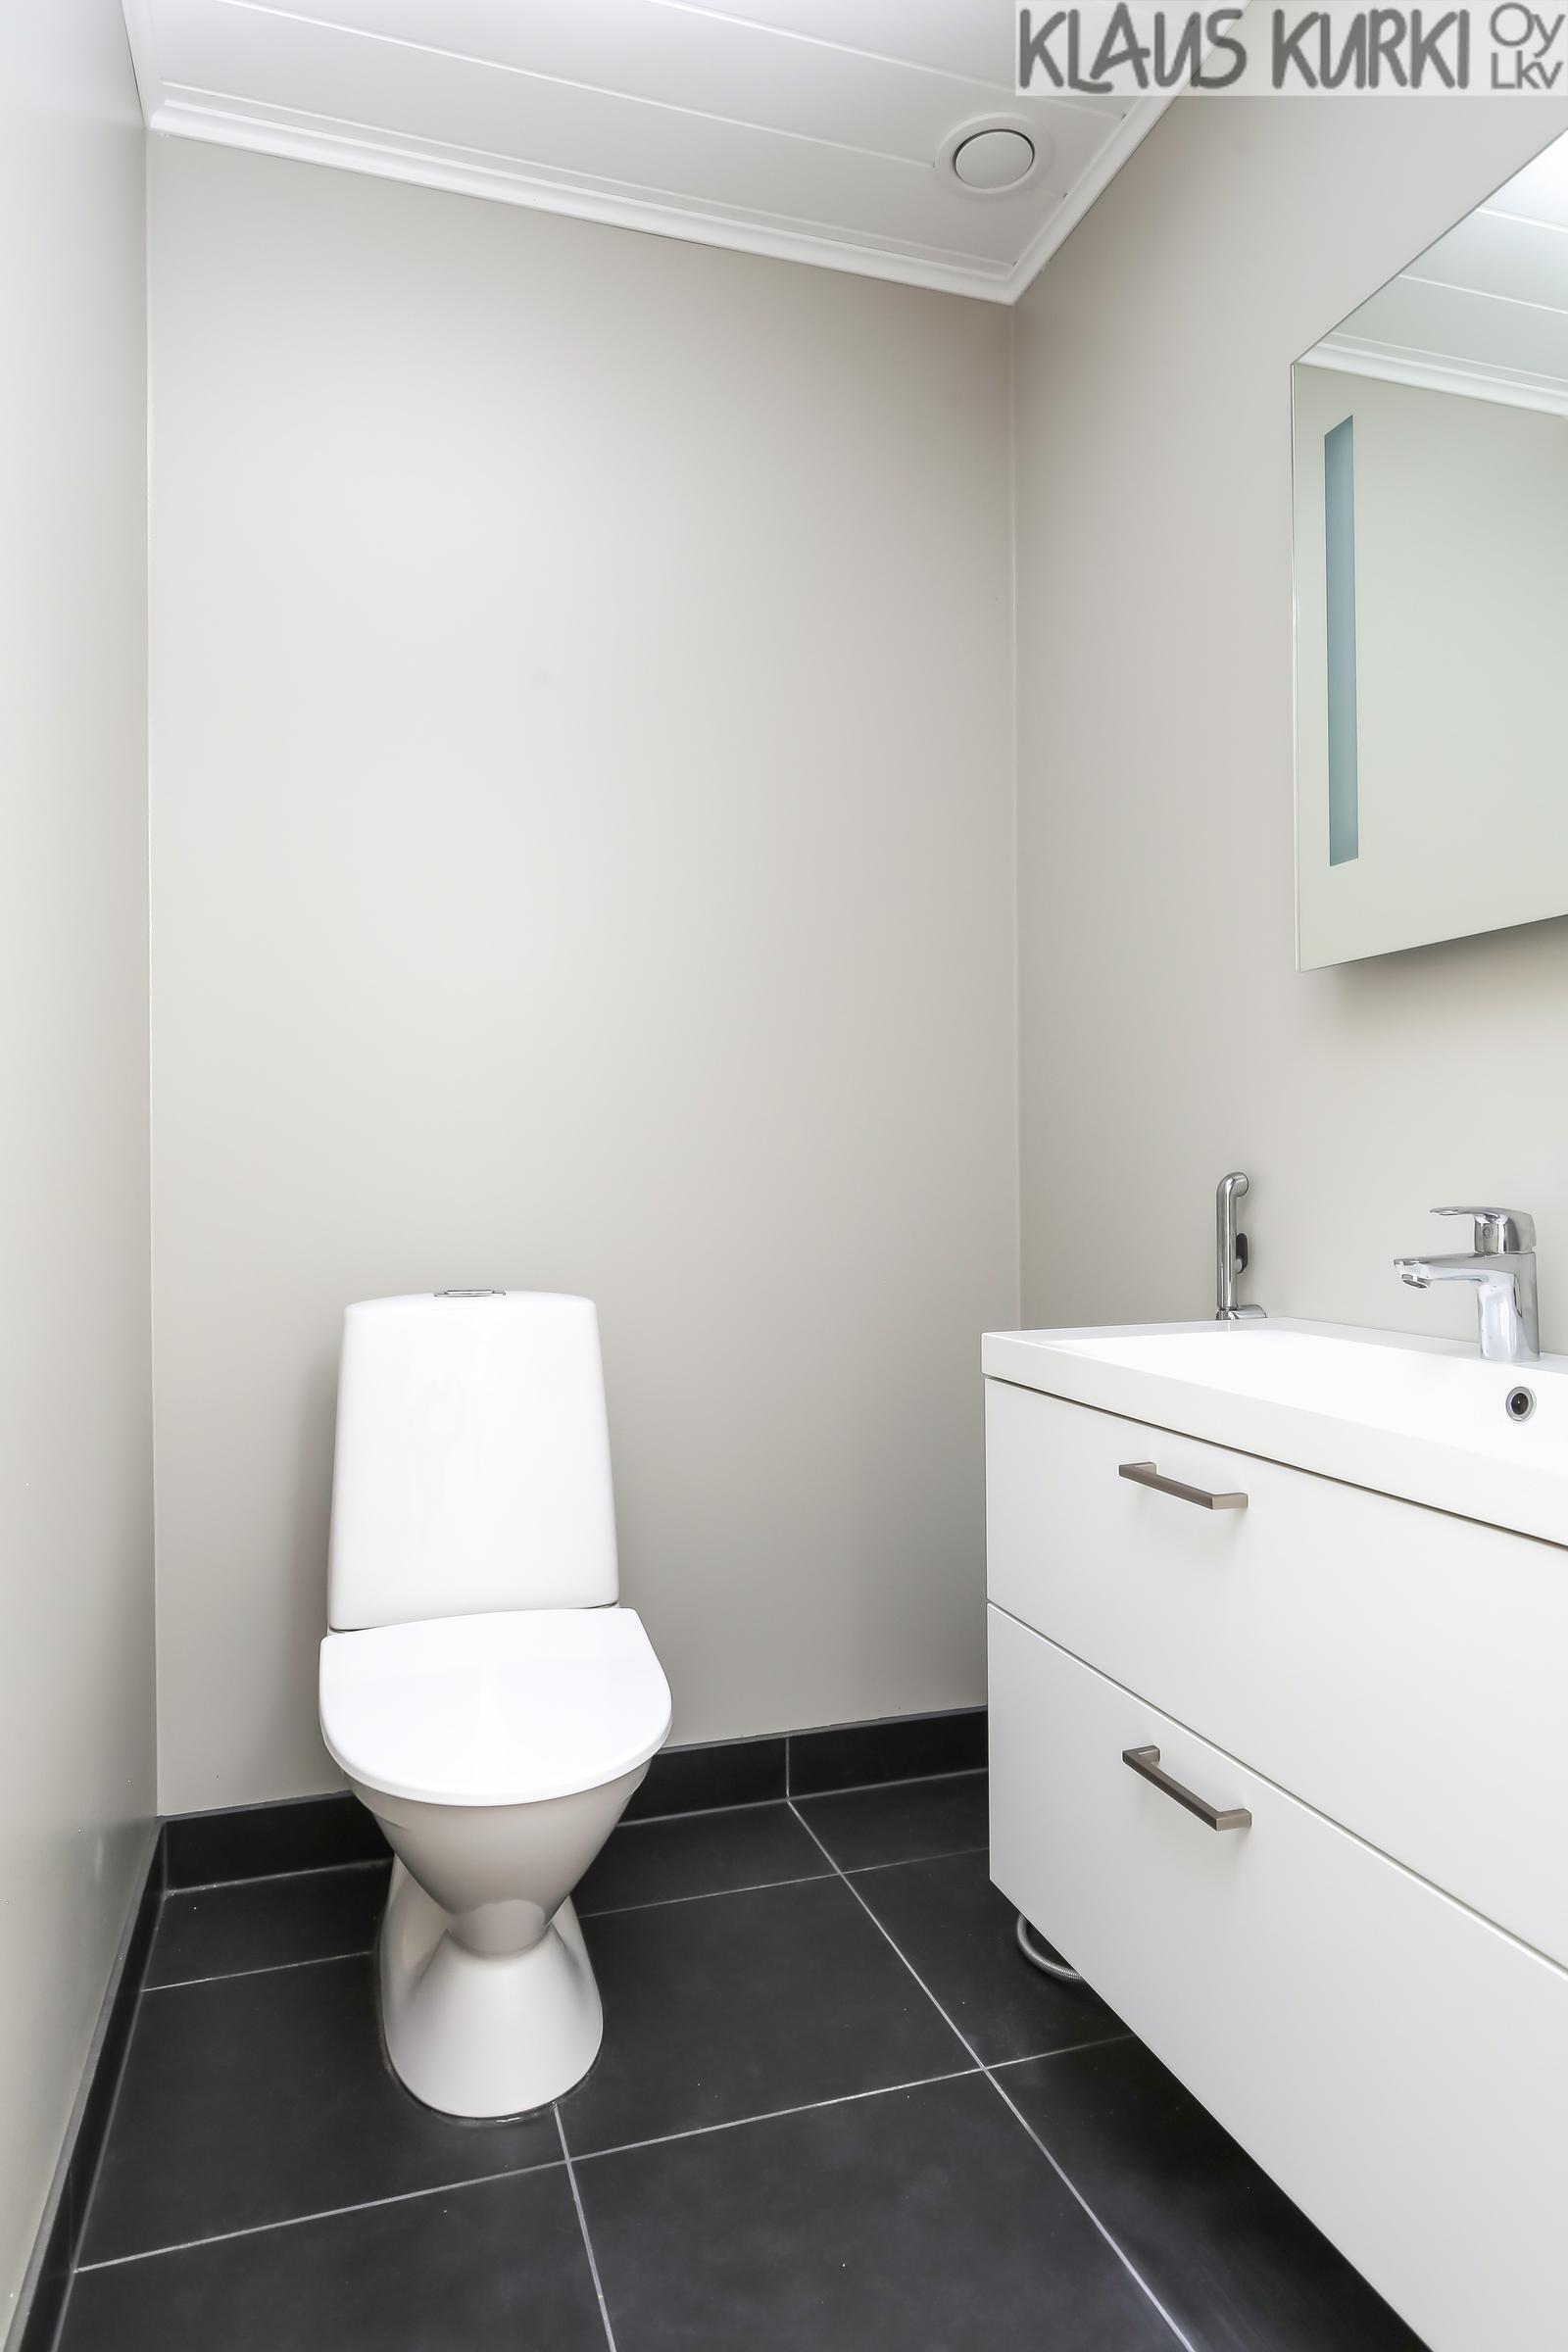 Erillinen wc.